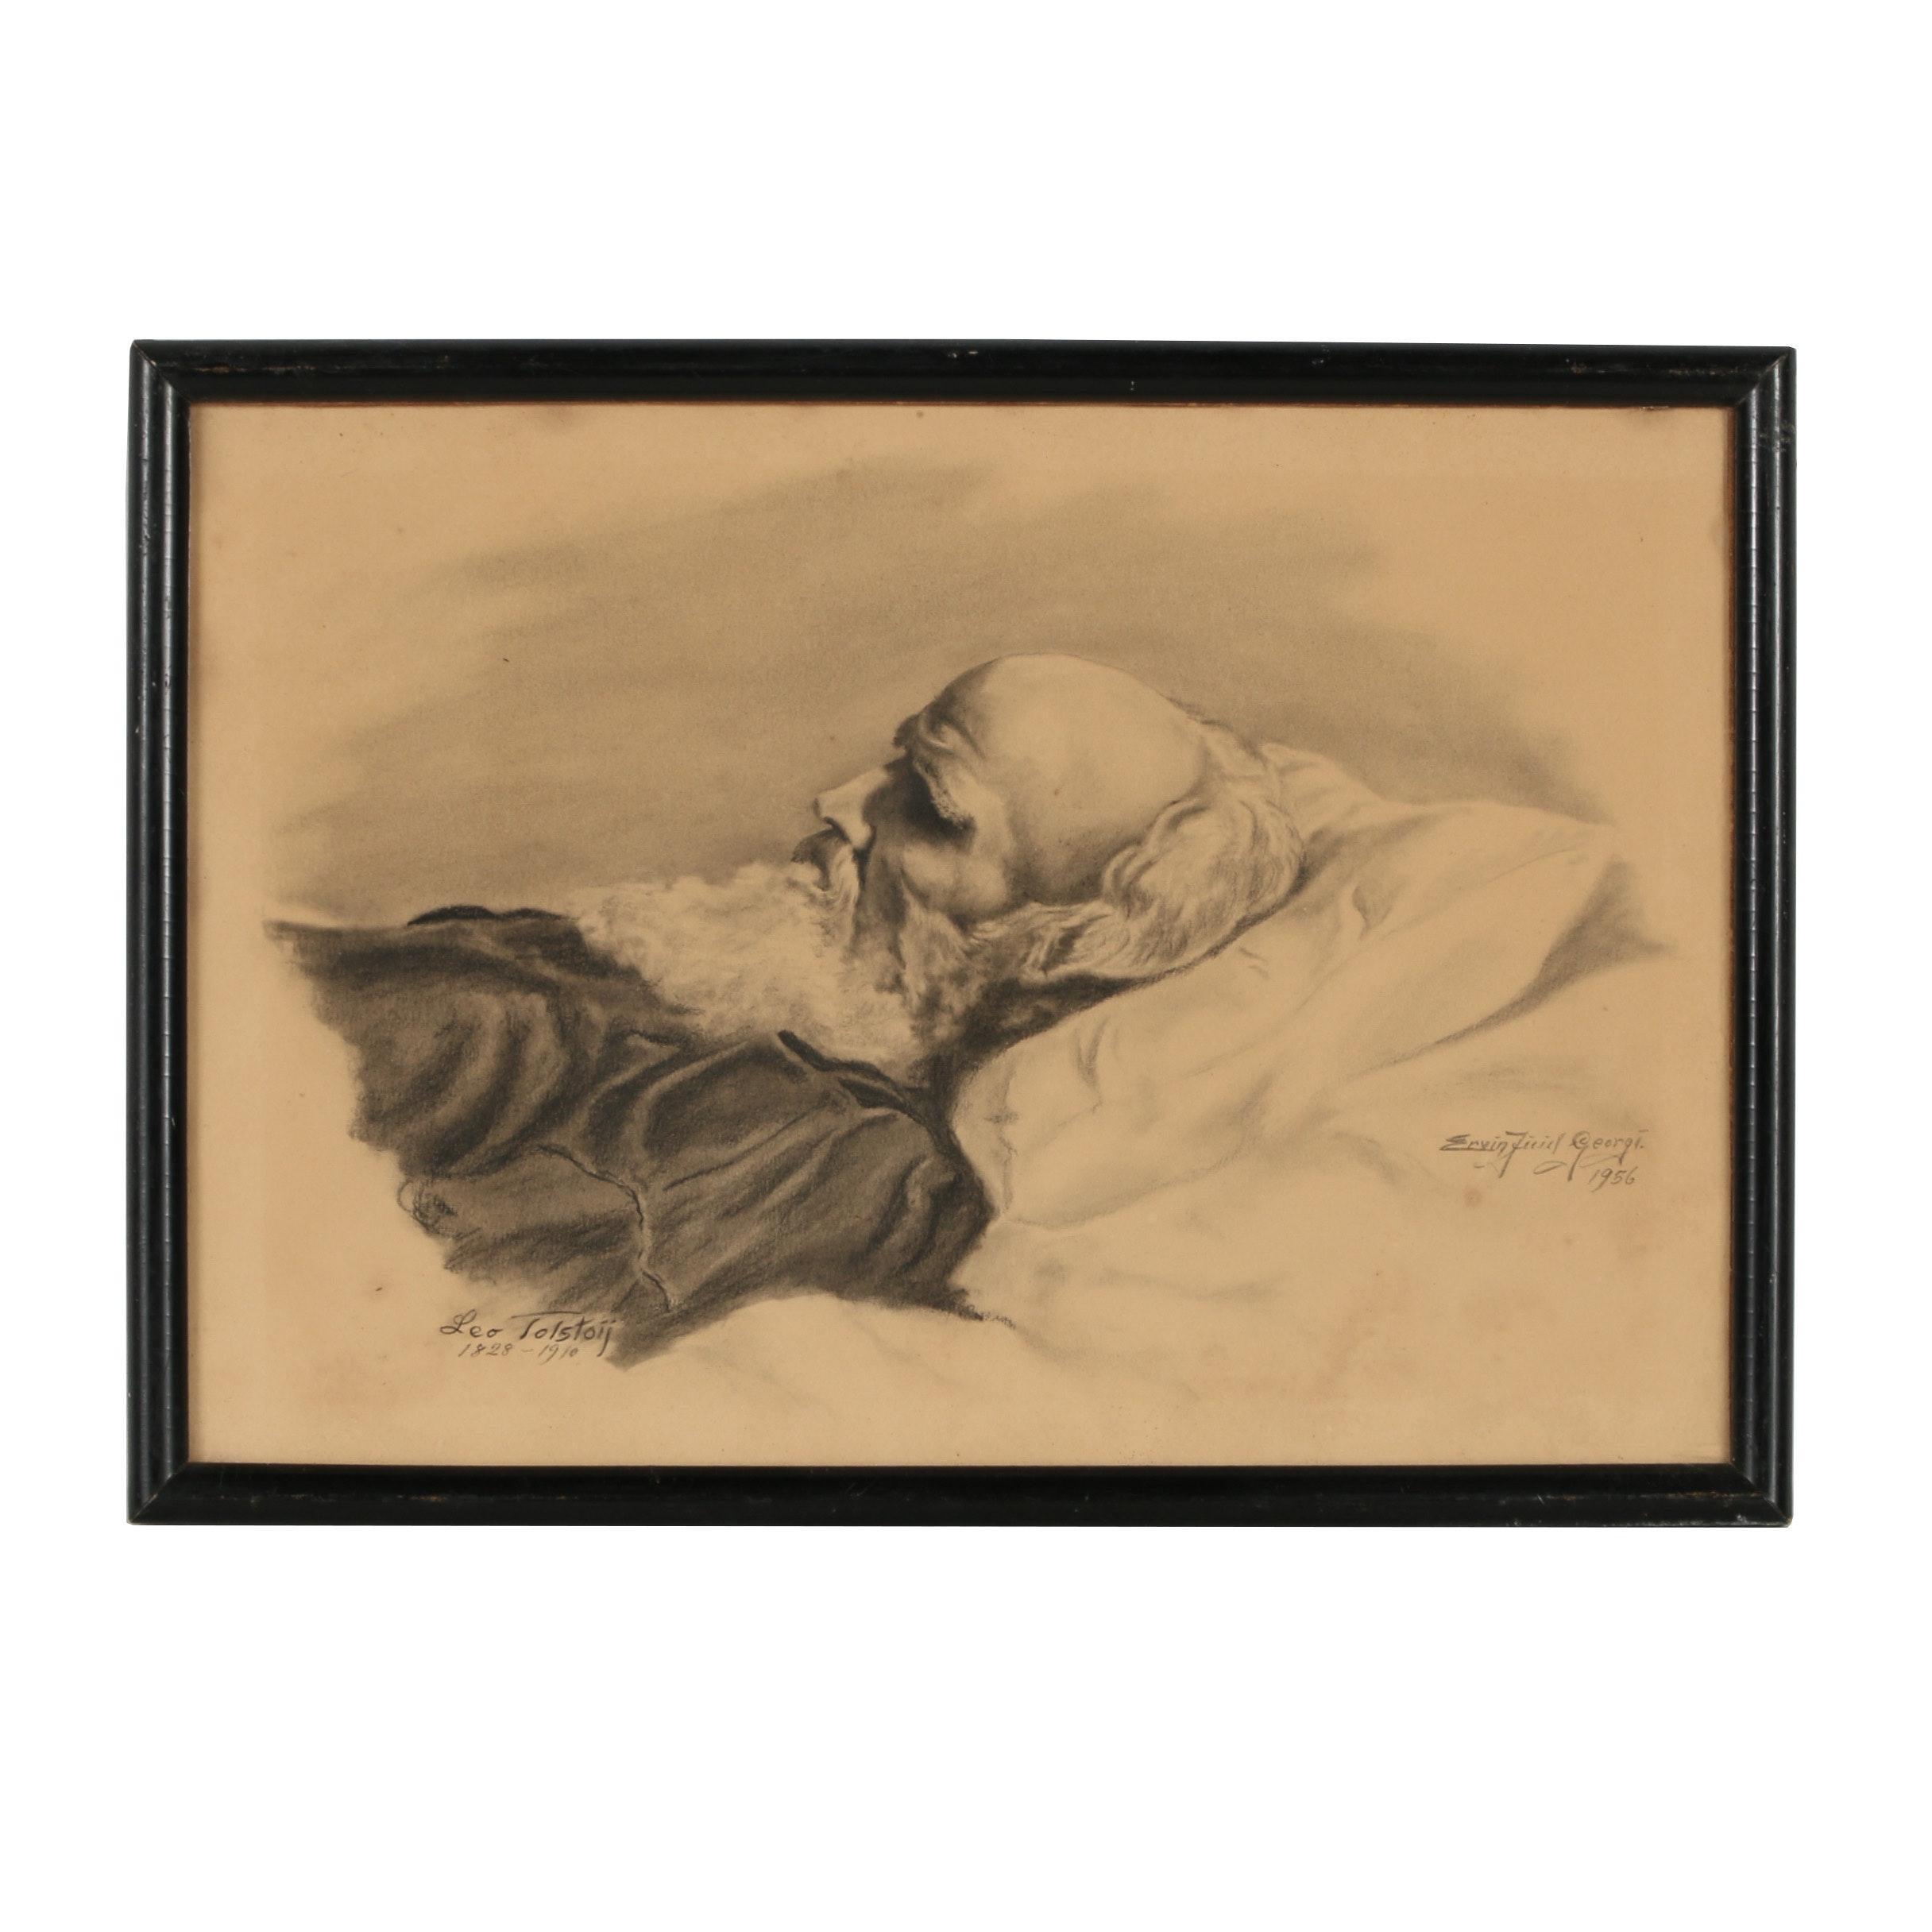 "Ervin Georgi Charcoal Drawing ""Leo Tolstoij"""